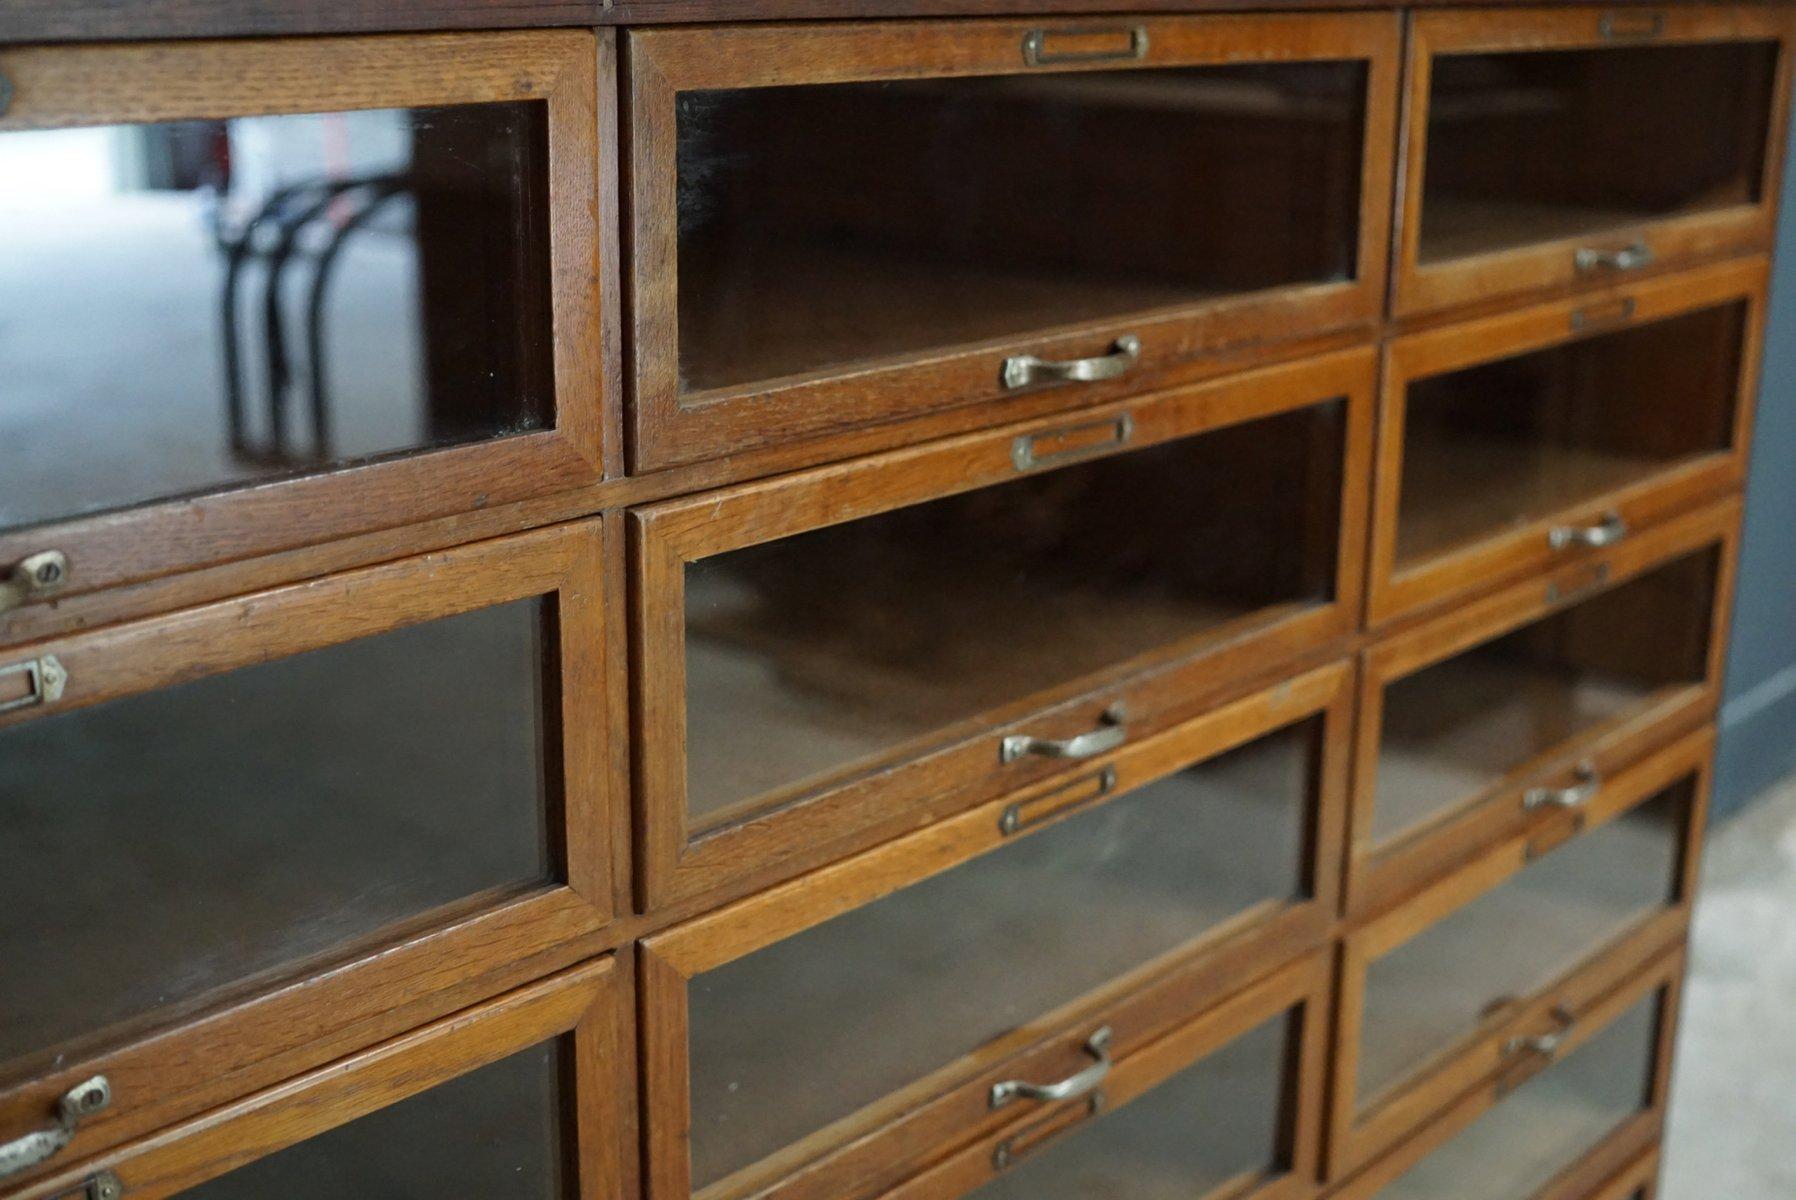 Vintage oak haberdashery shop cabinet 1930s for sale at for 1930s kitchen cabinets for sale